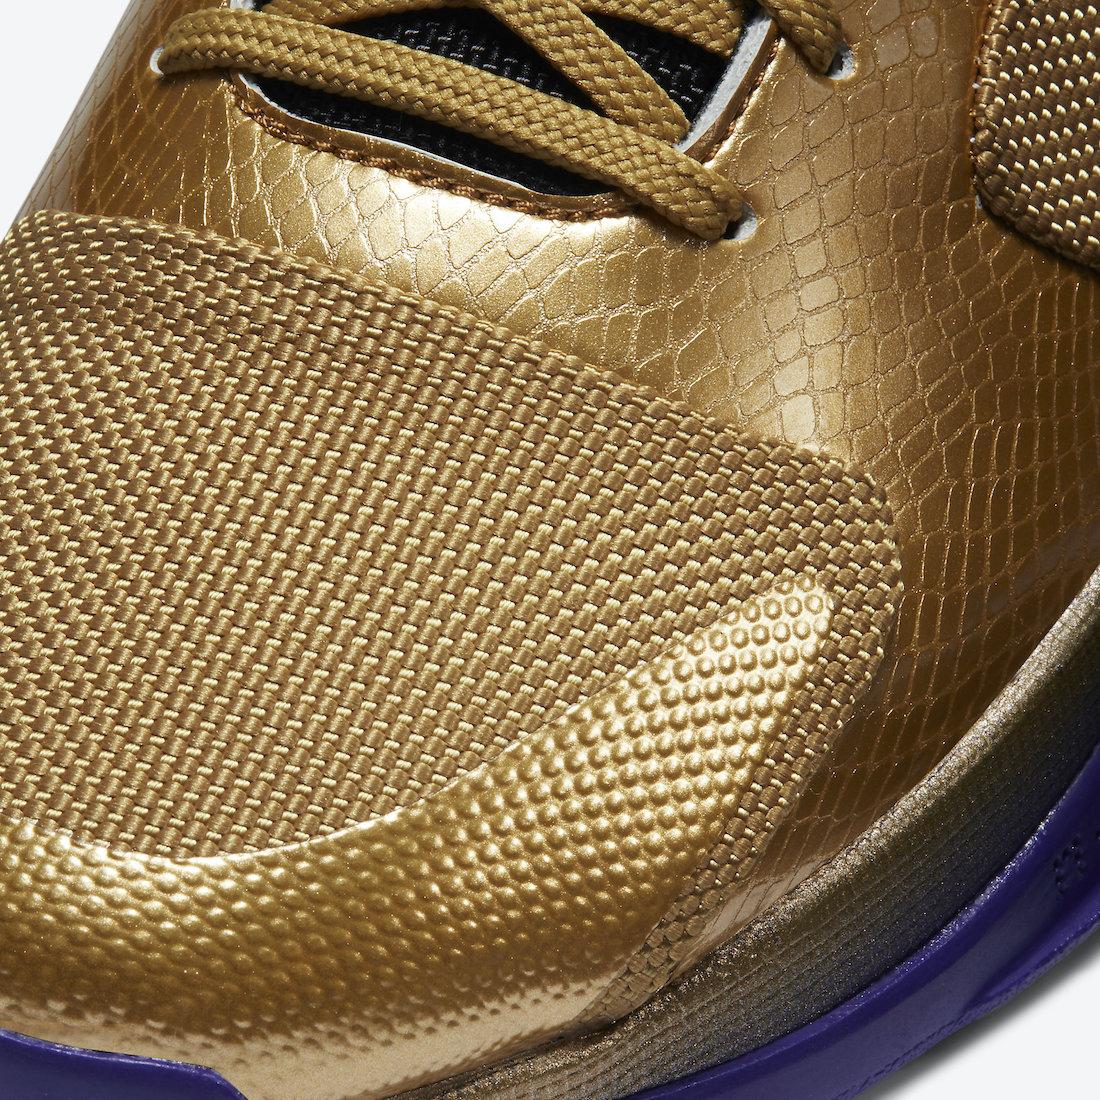 Undefeated Nike Kobe 5 Protro Hall of Fame DA6809-700 Release Date